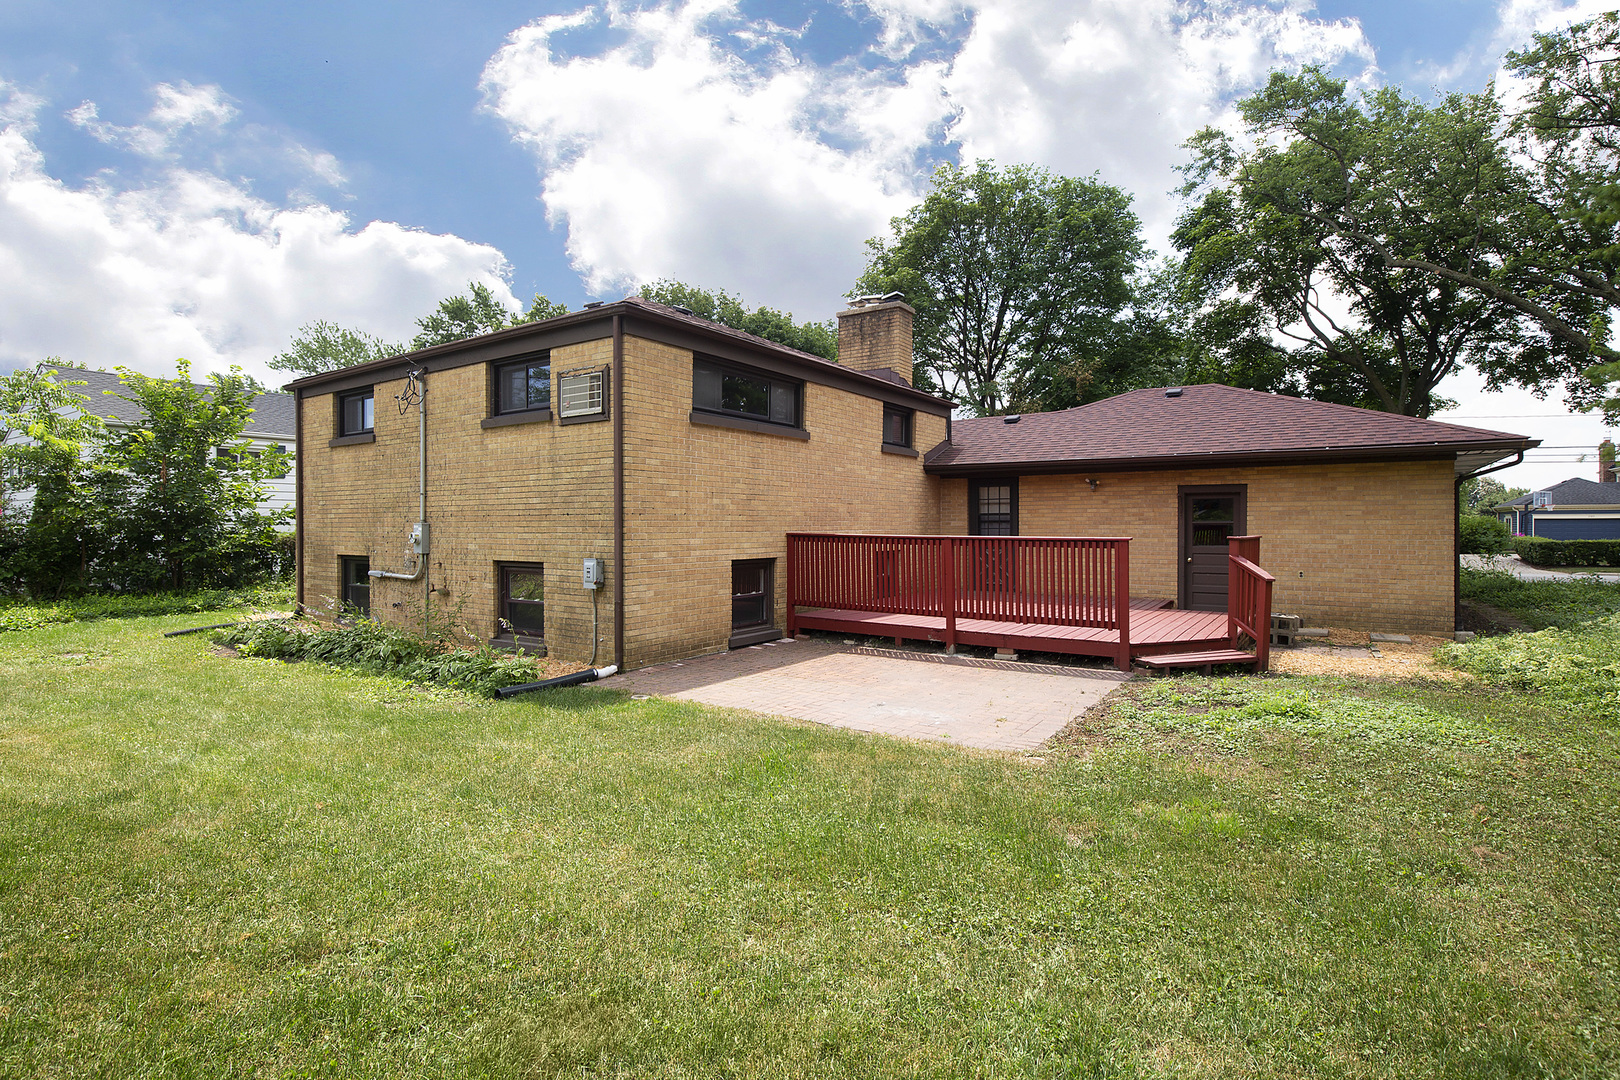 1104 West Lincoln, Mount Prospect, Illinois, 60056